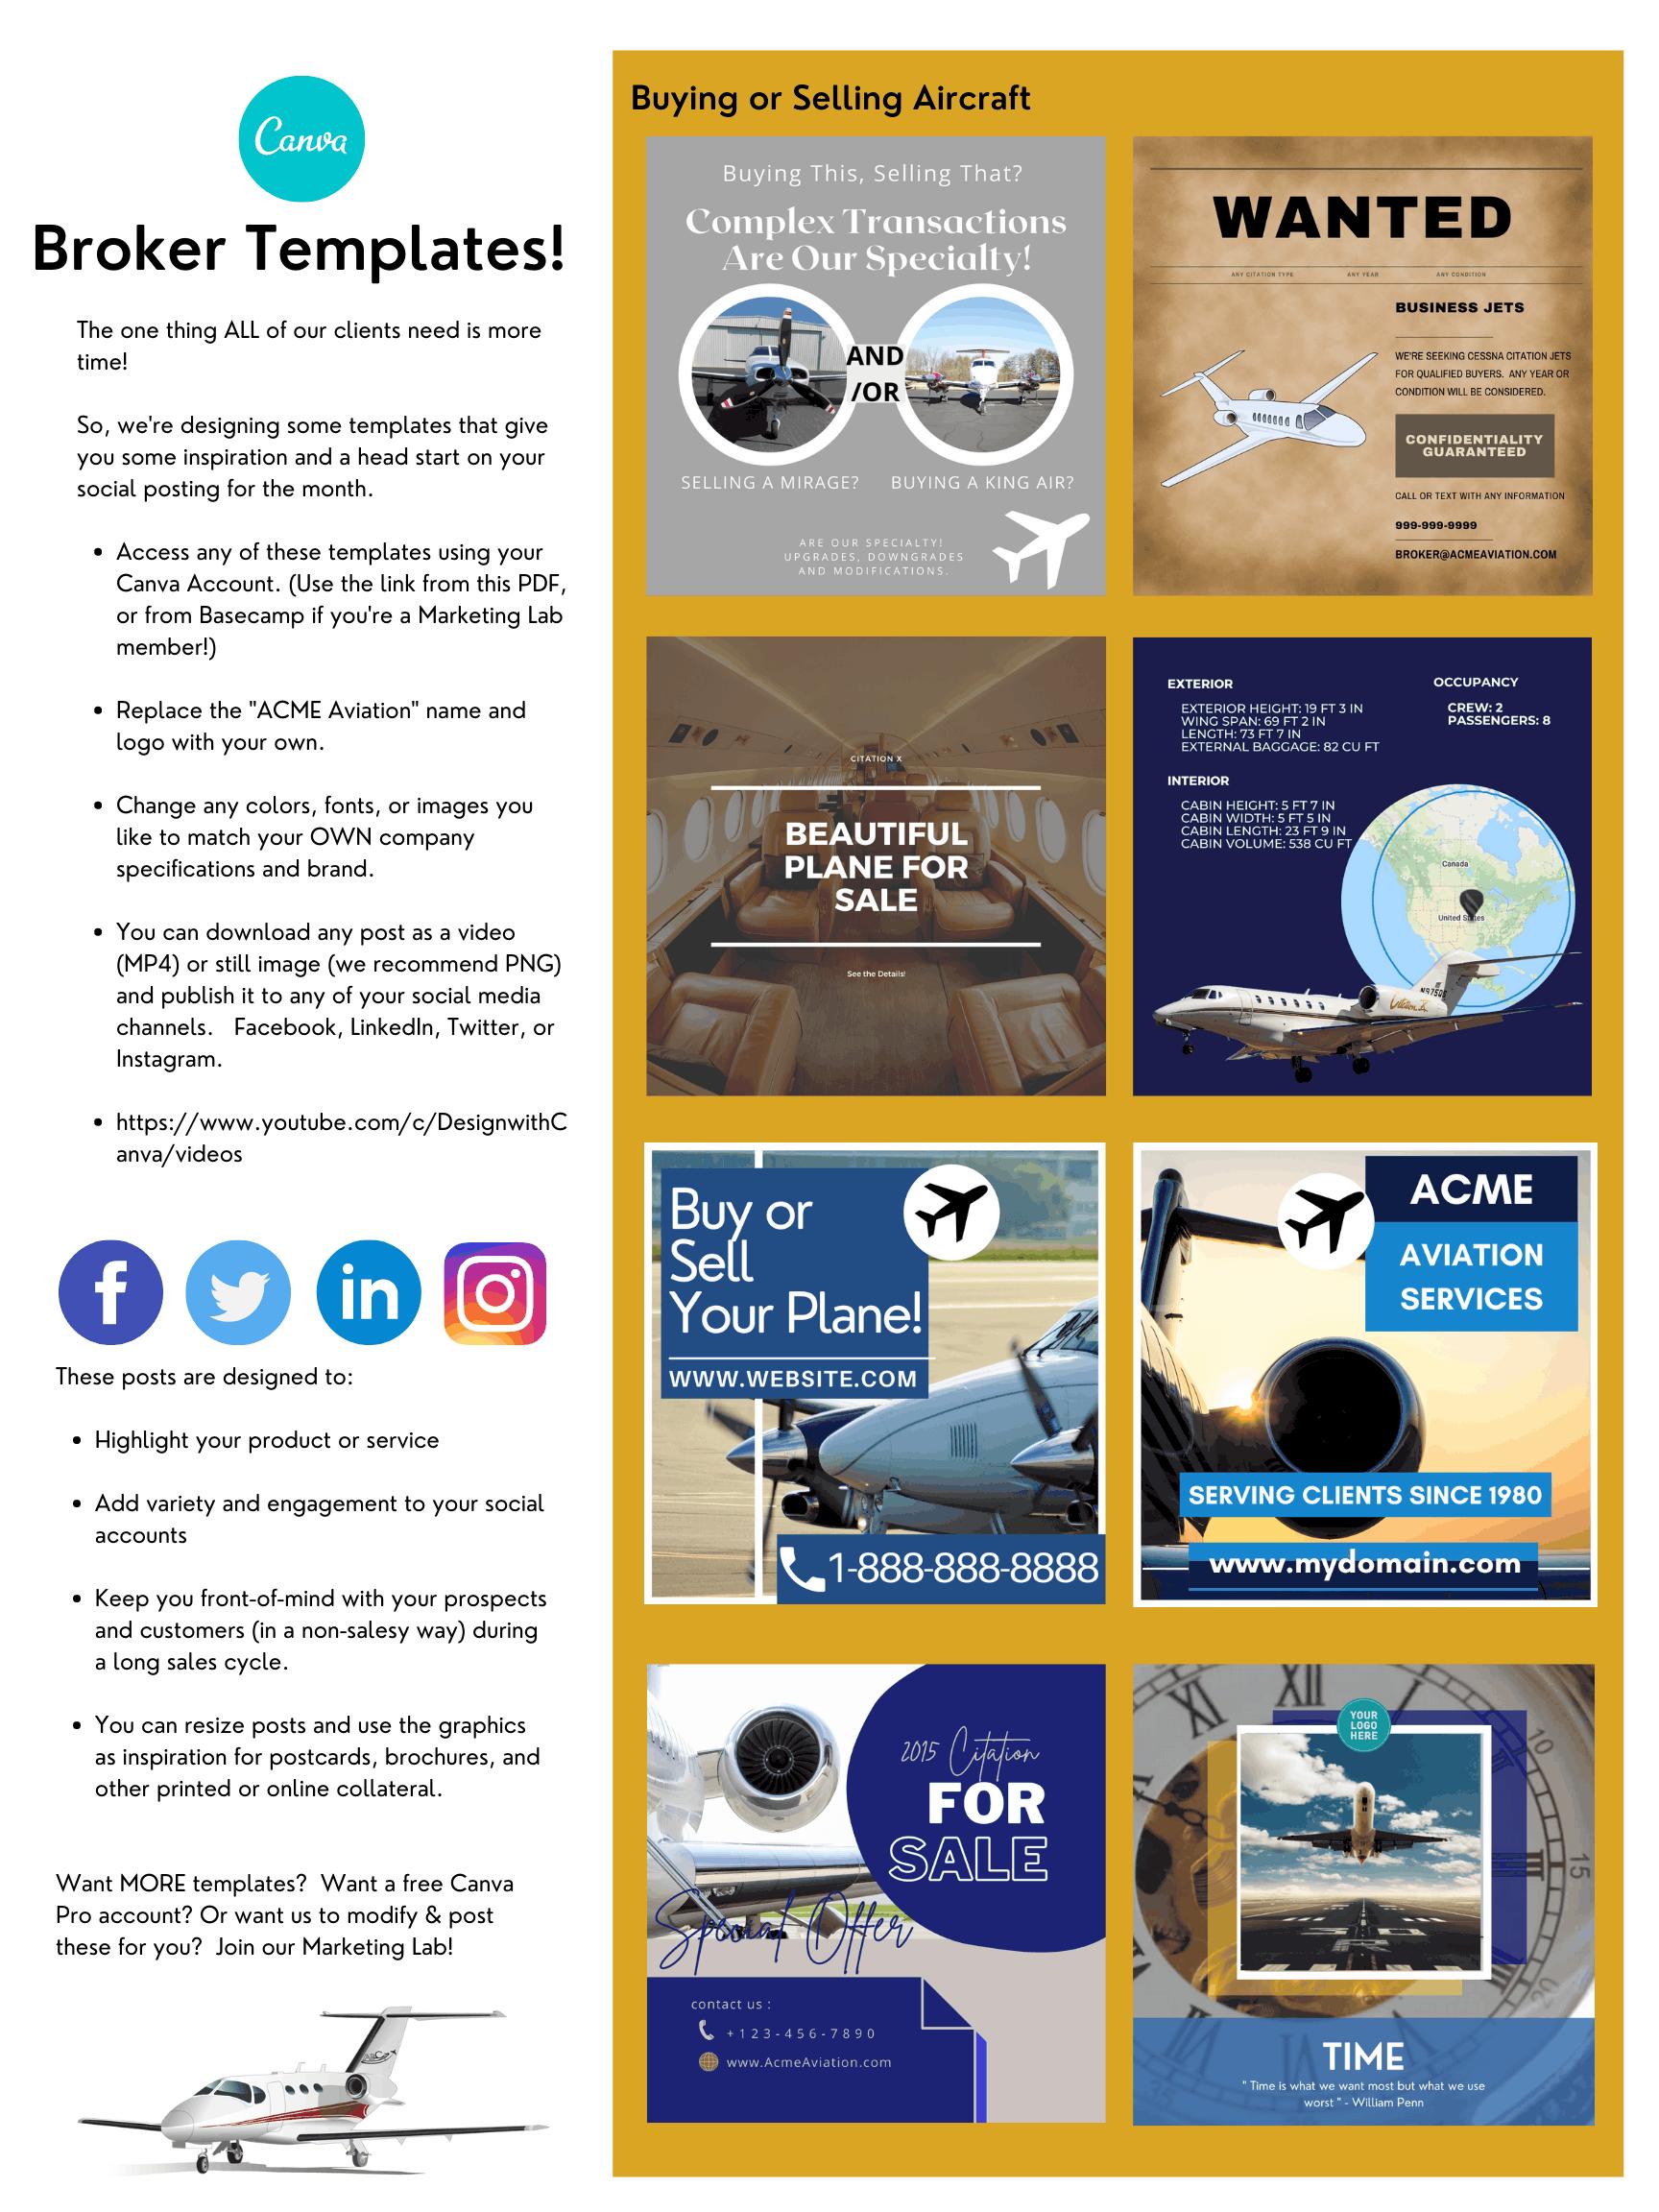 Aircraft Broker Templates